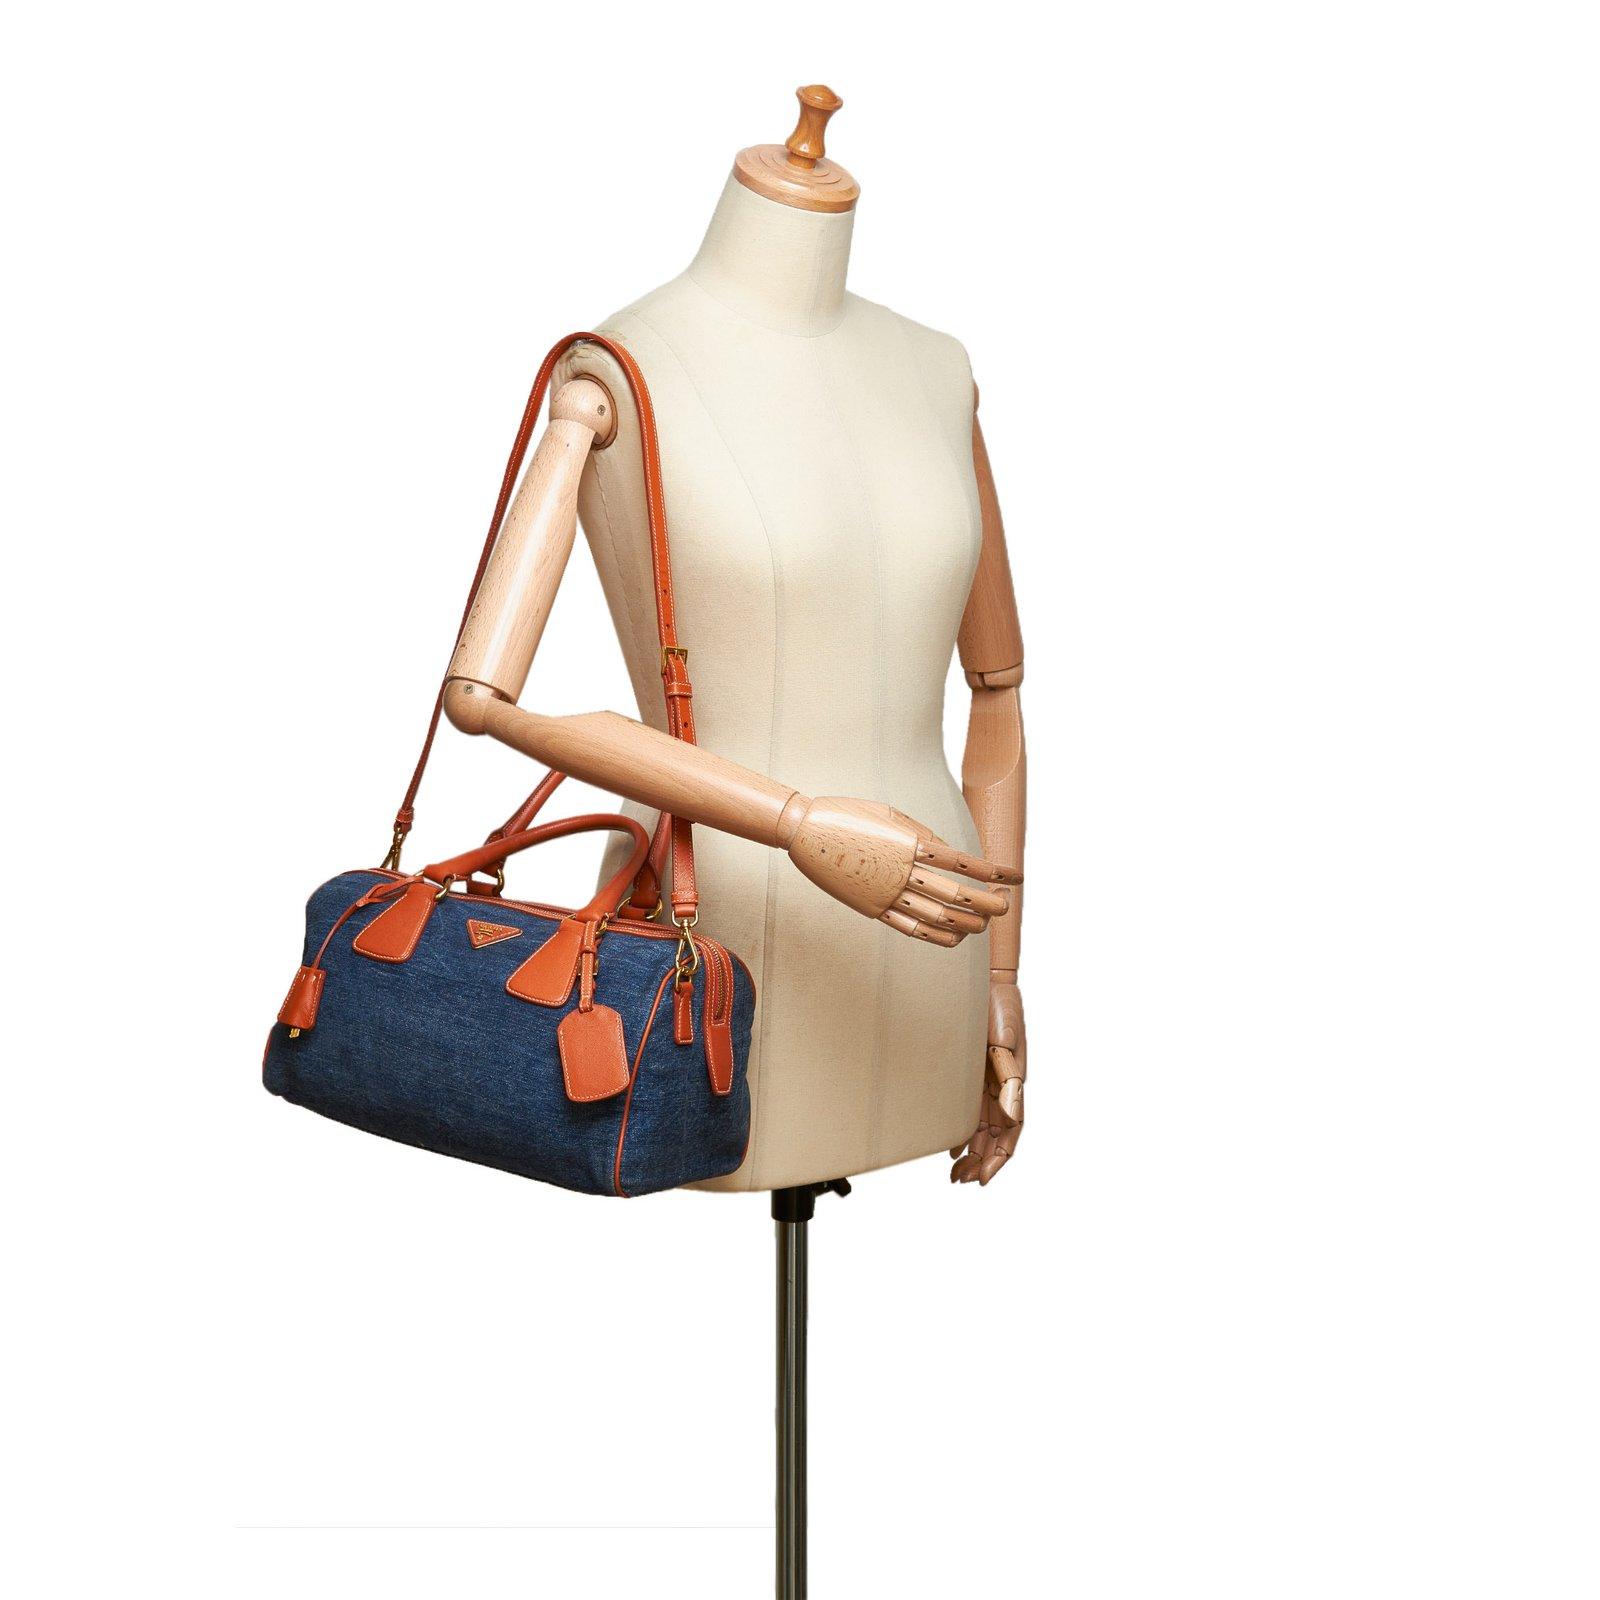 fed57f4dc66a Prada Denim Satchel Handbags Leather,Other,Denim,Cloth Blue,Other,Orange  ref.99197 - Joli Closet